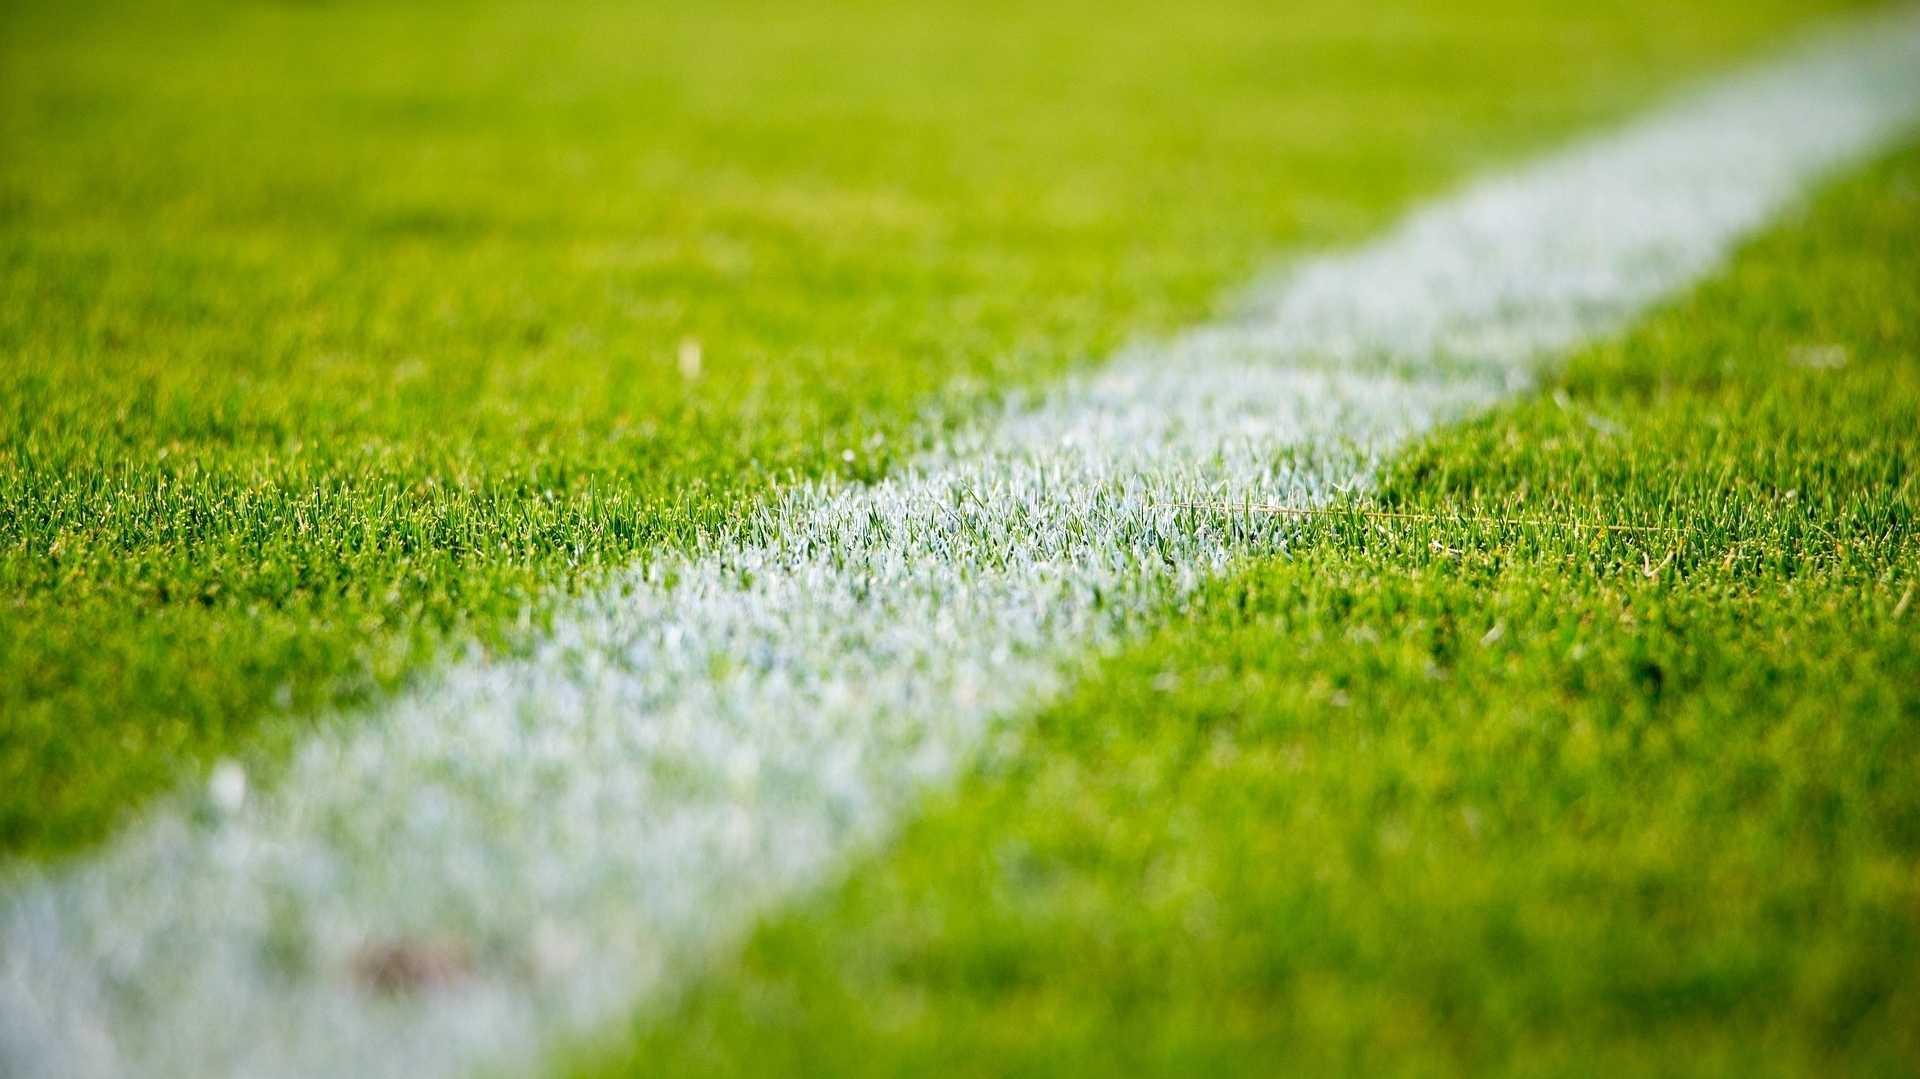 RTL UHD: Fußball erstmals in Ultra HD mit erhöhtem Kontrastumfang